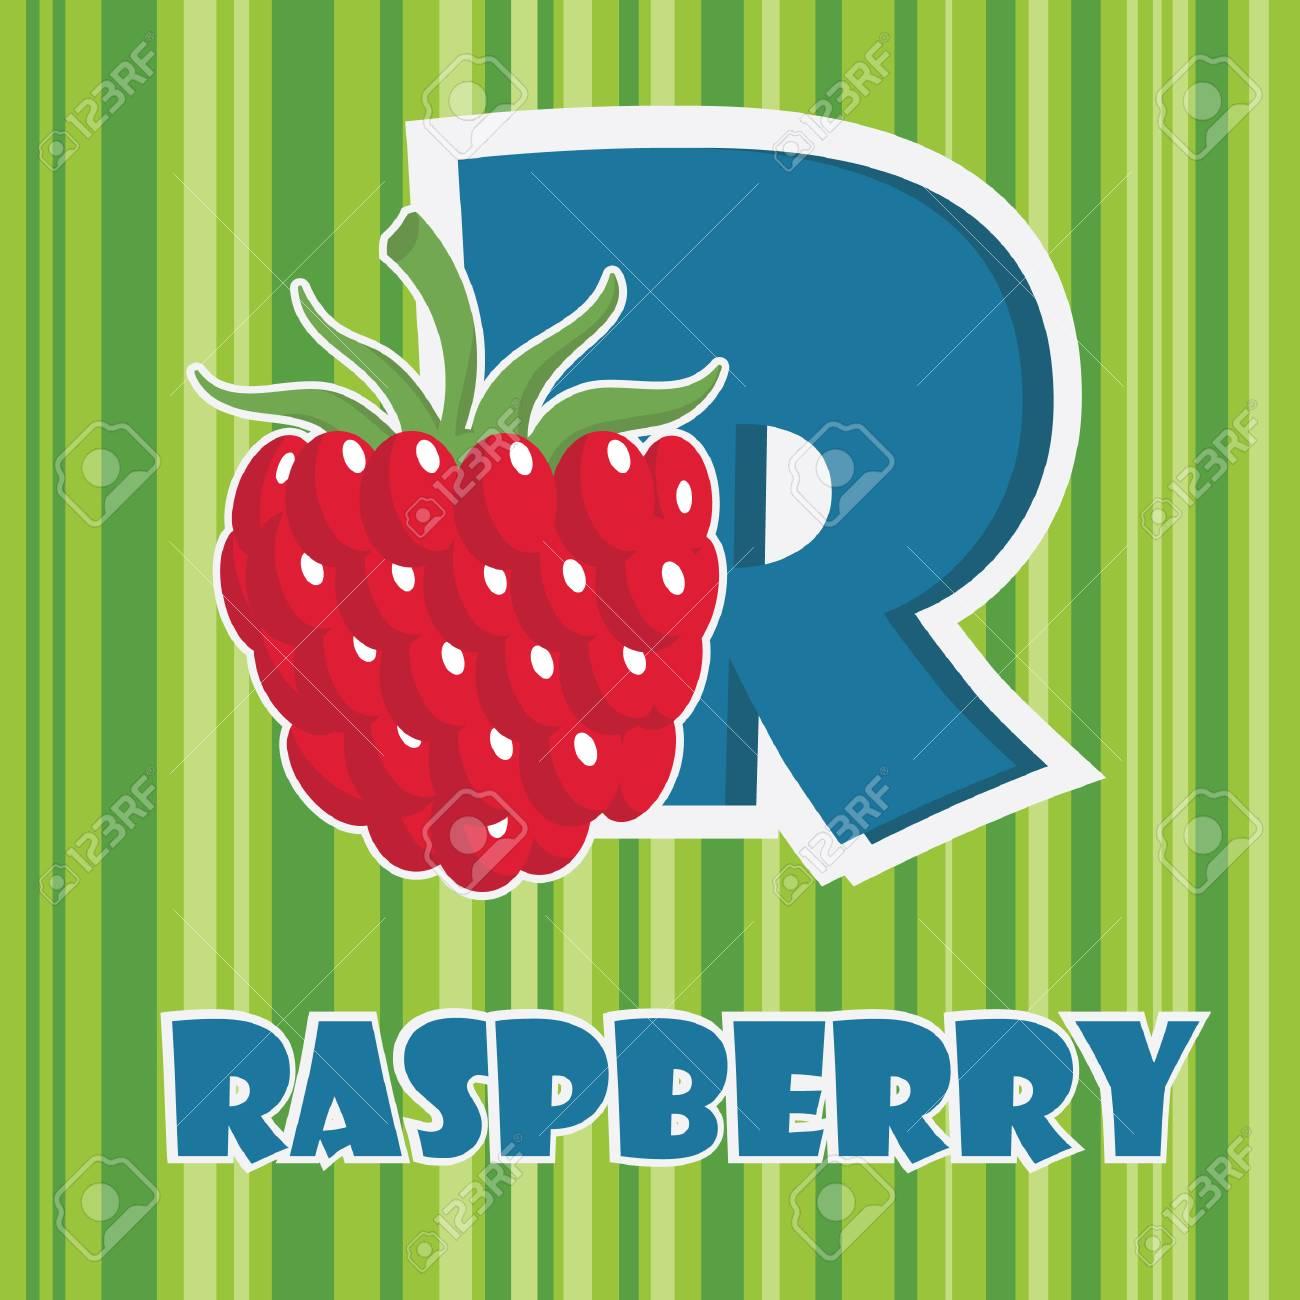 r for raspberry - 106672332